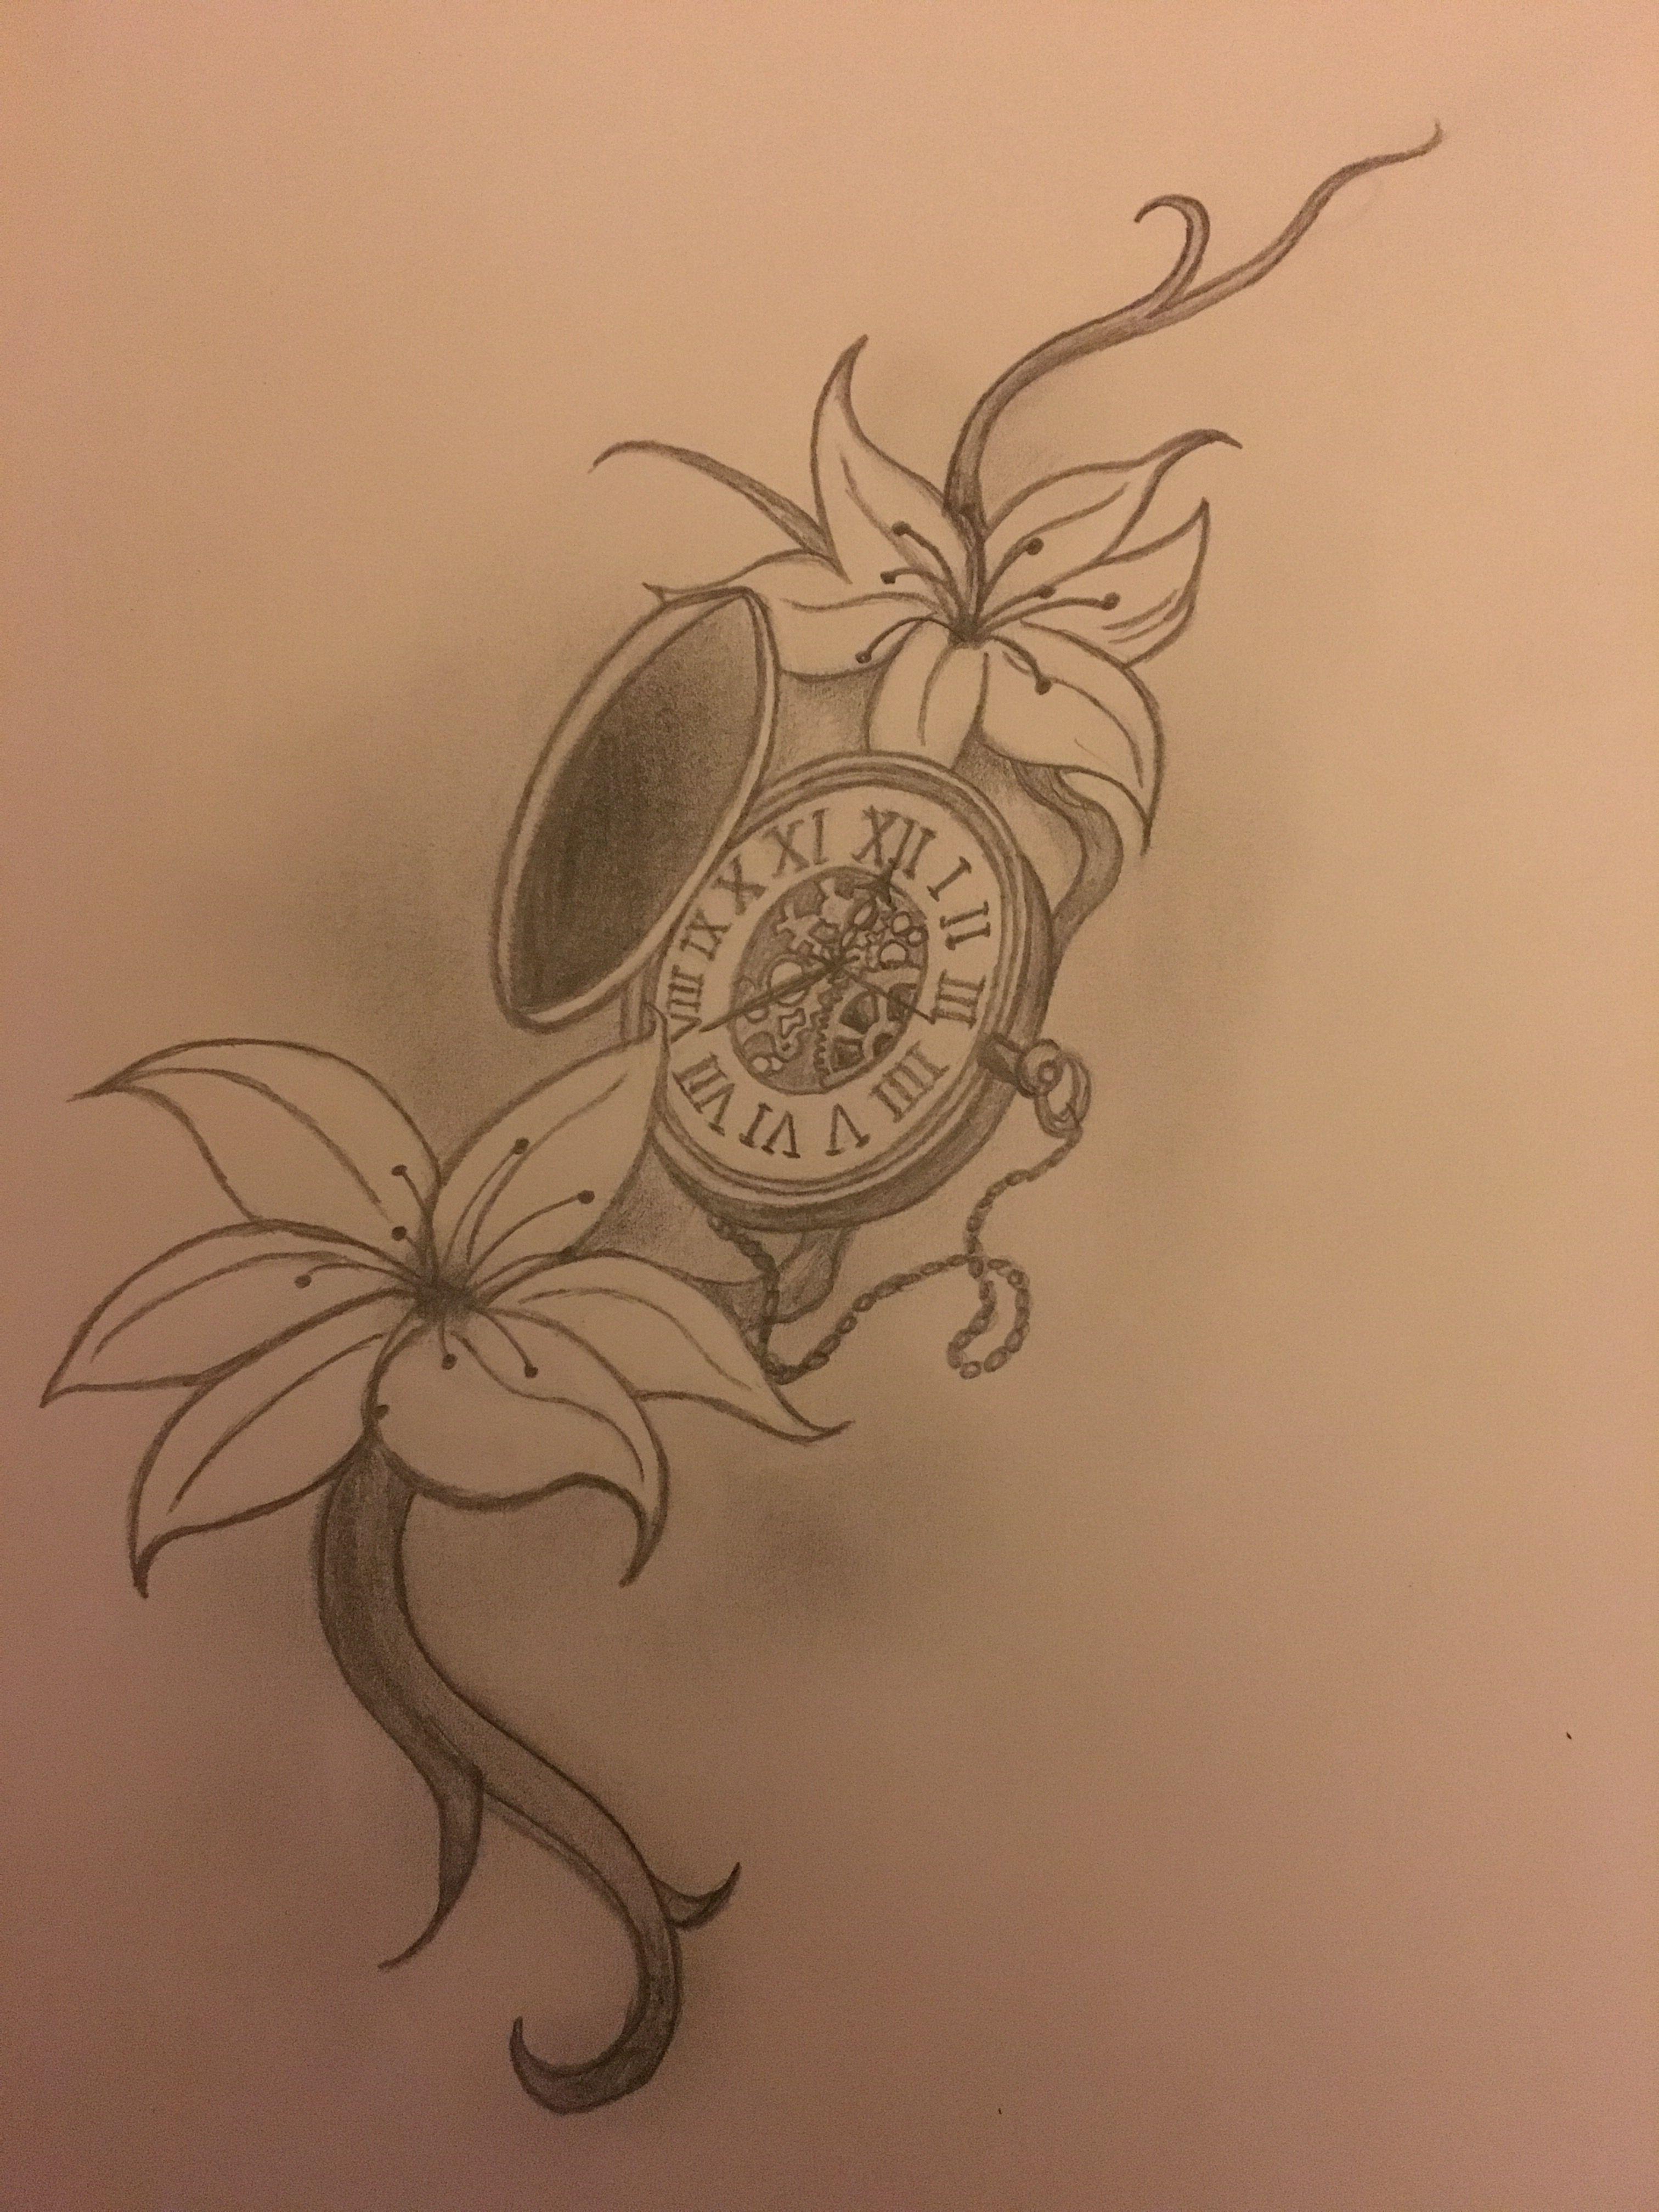 3024x4032 Pocket Watch Clock Jasmine Flowers Potential Tattoo Sketch Drawing